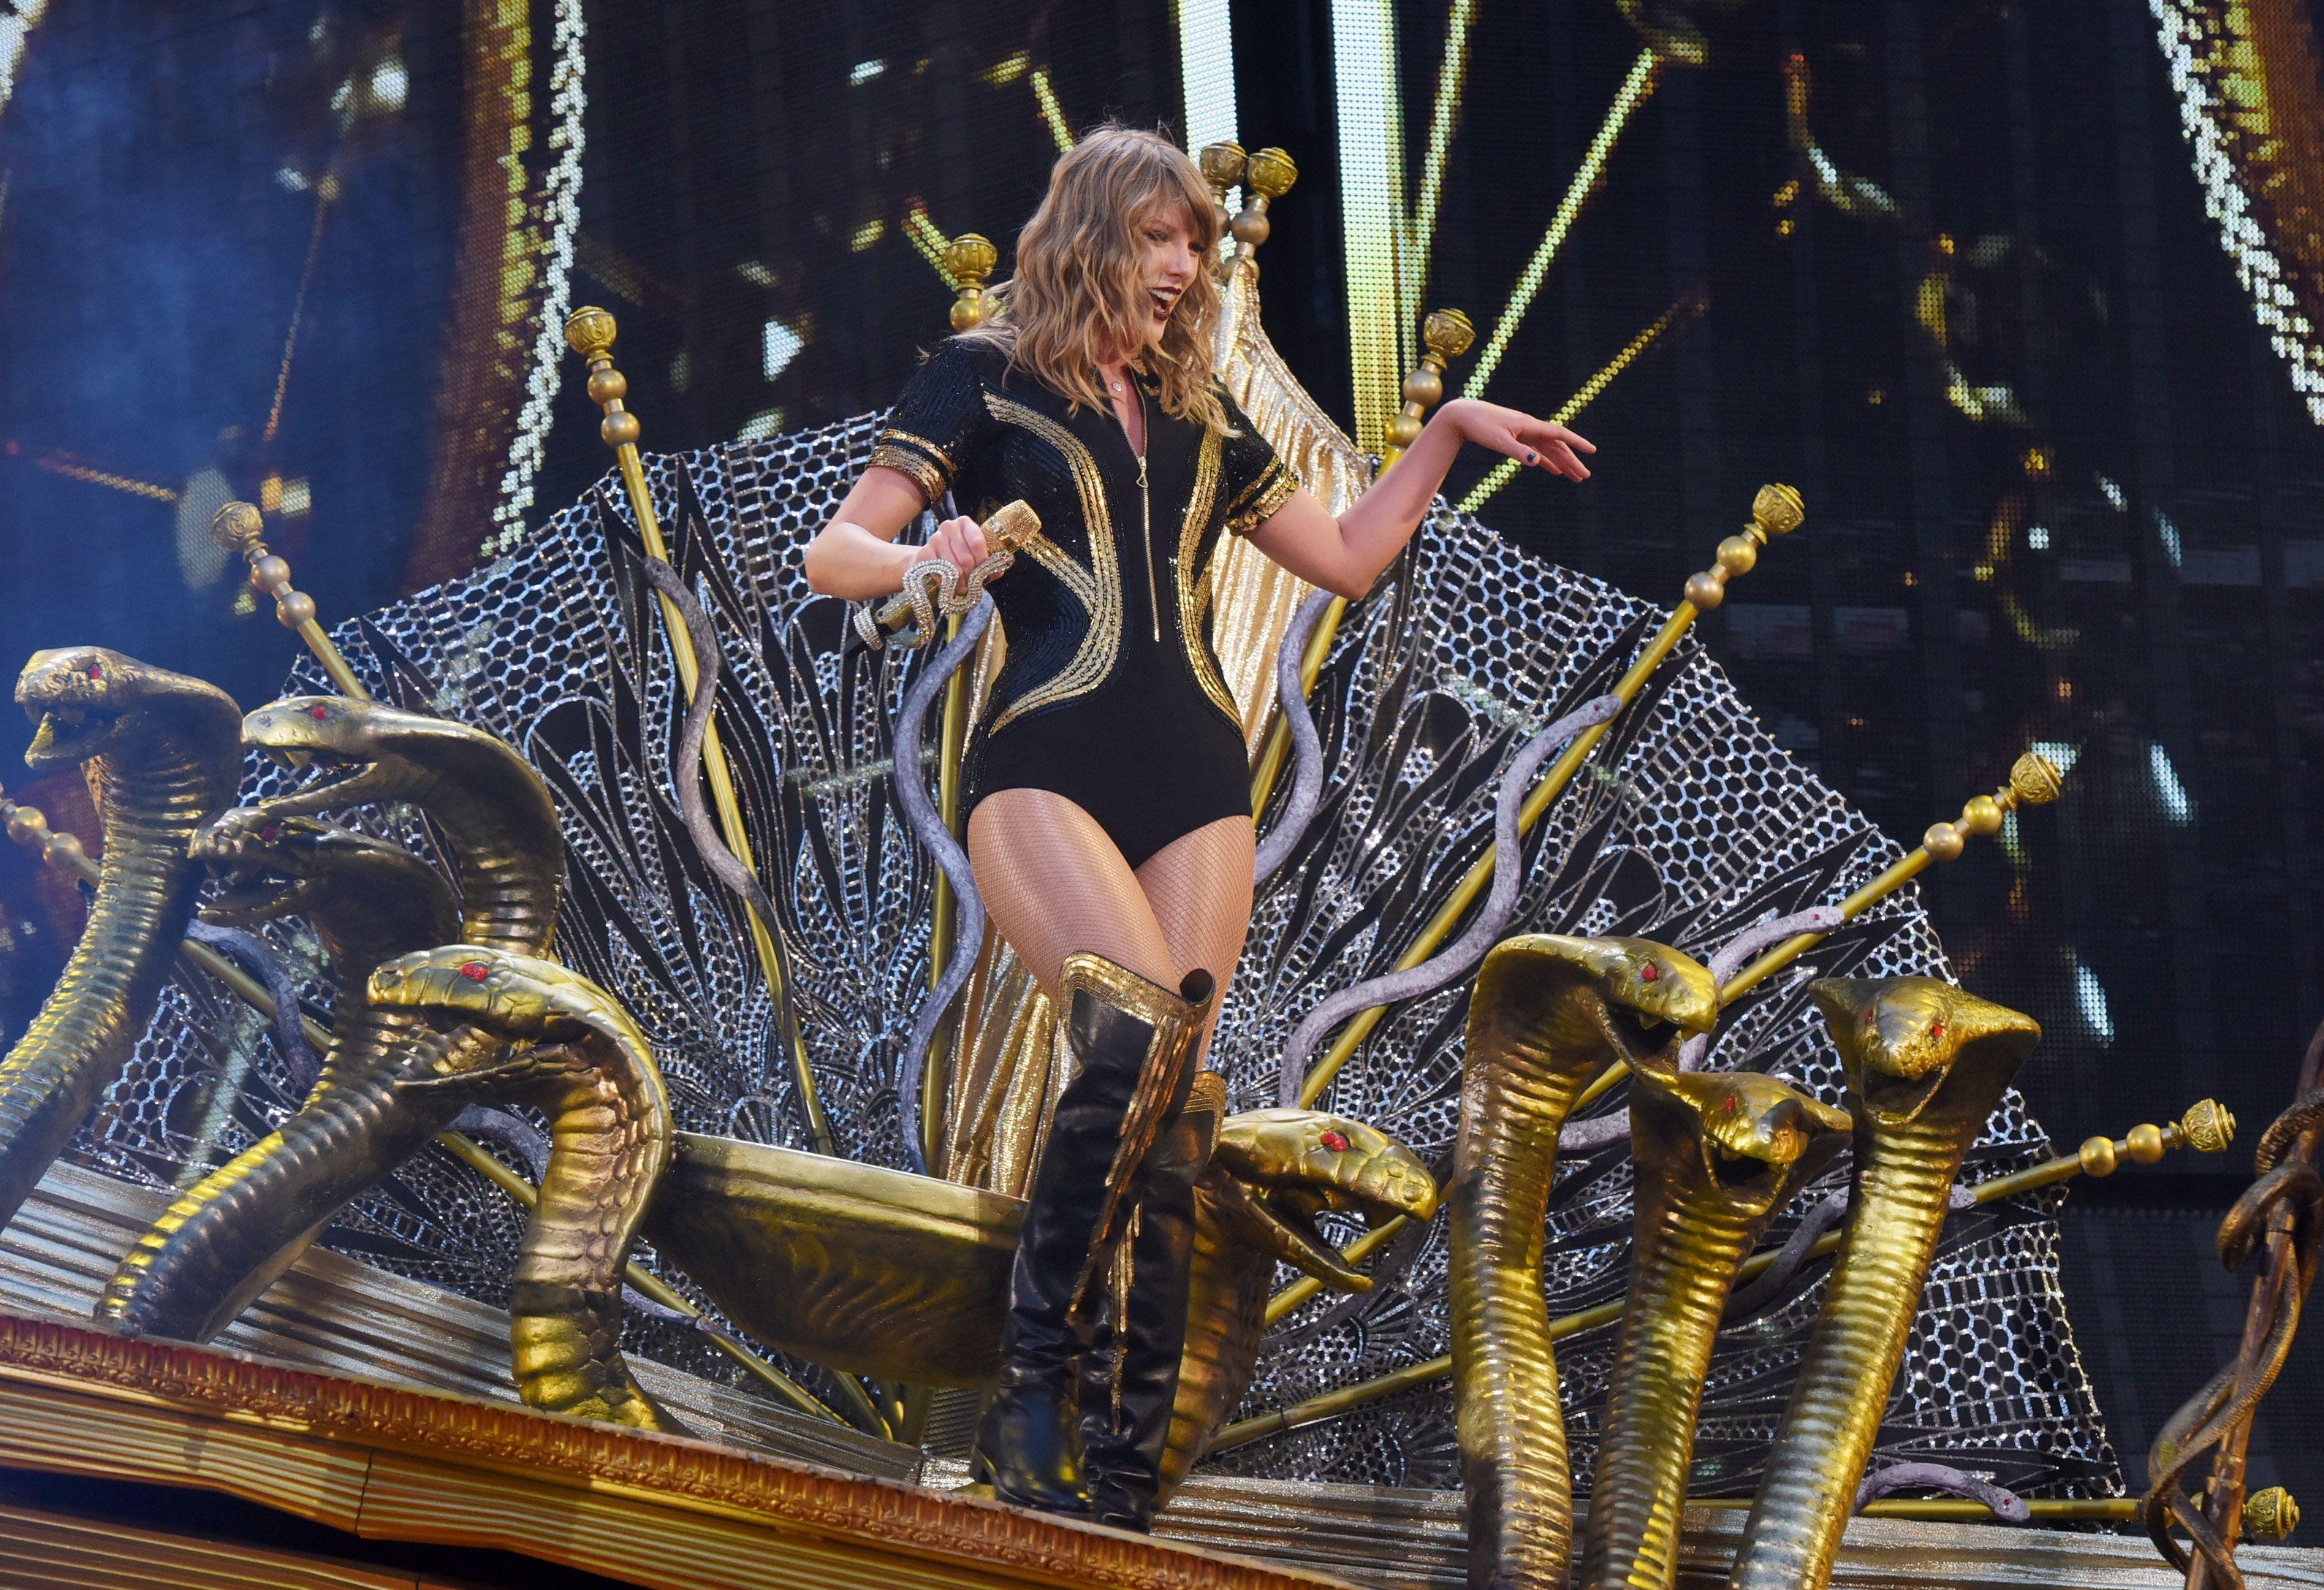 Taylor swift concert, Taylor swift music, Taylor swift ...